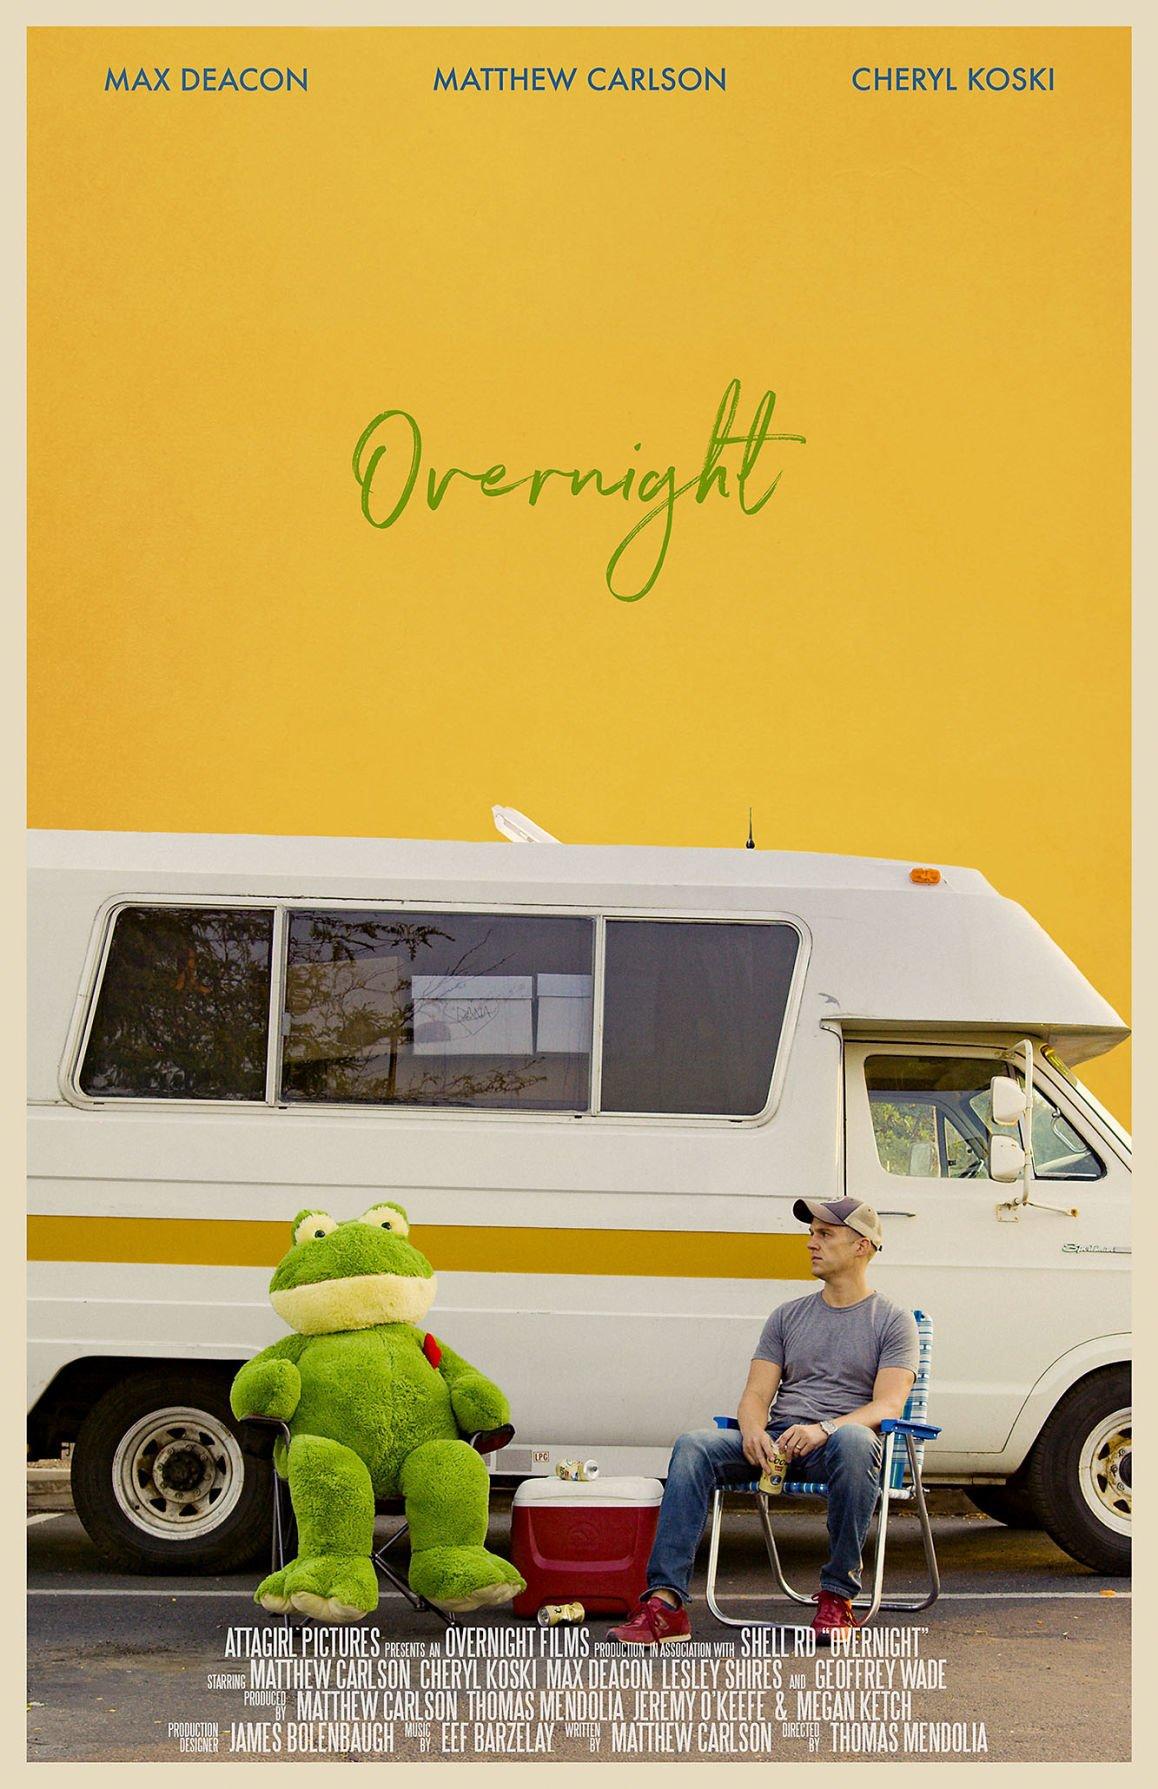 072519_con_filmfest_overnight